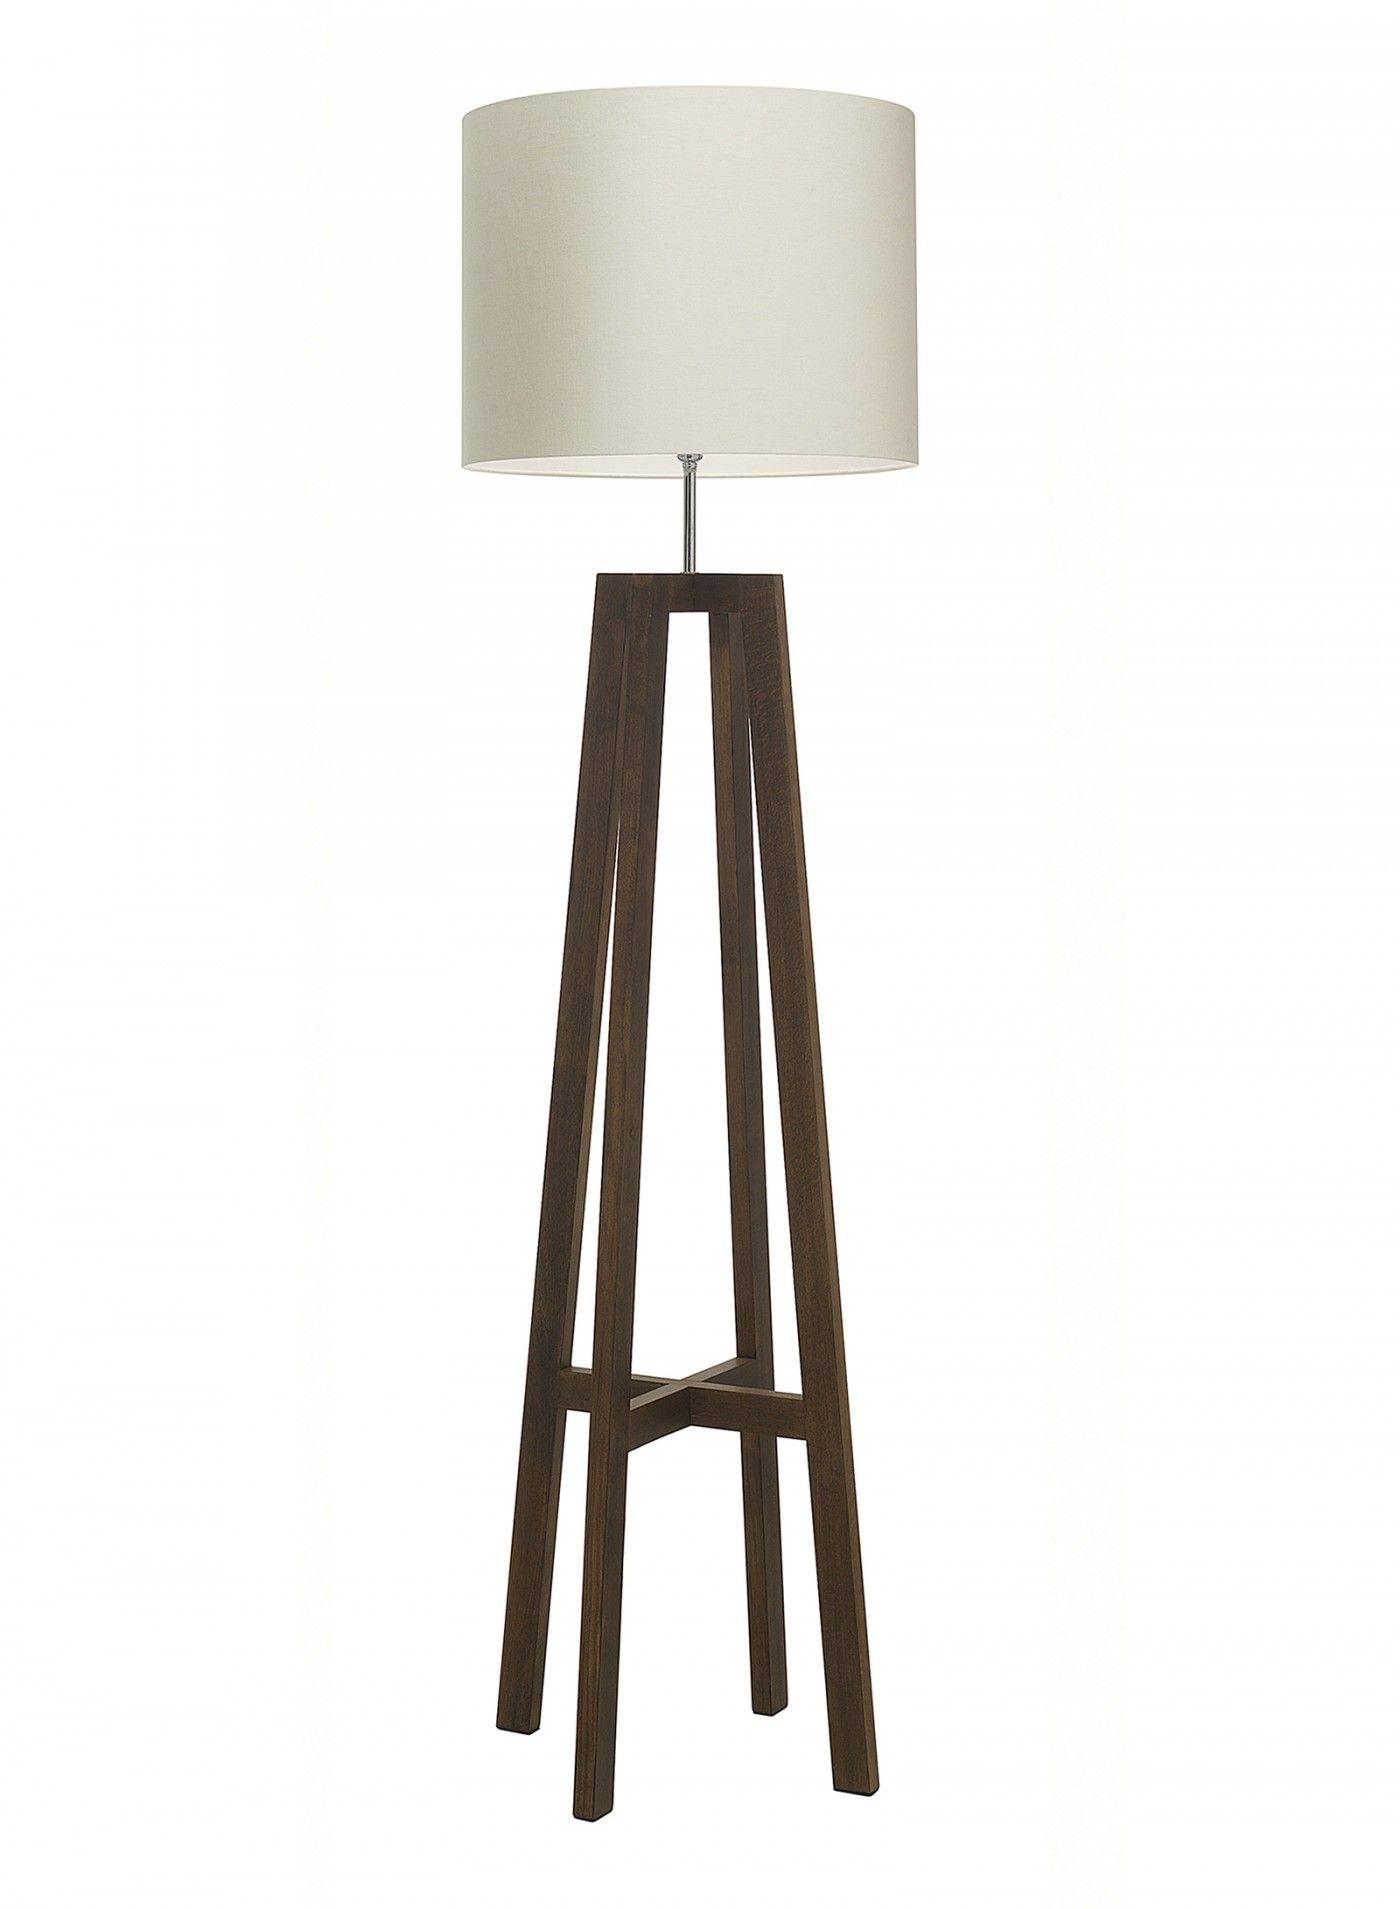 Tripod antique oak floor lamp heathfield co light floor tripod antique oak floor lamp heathfield co geotapseo Choice Image